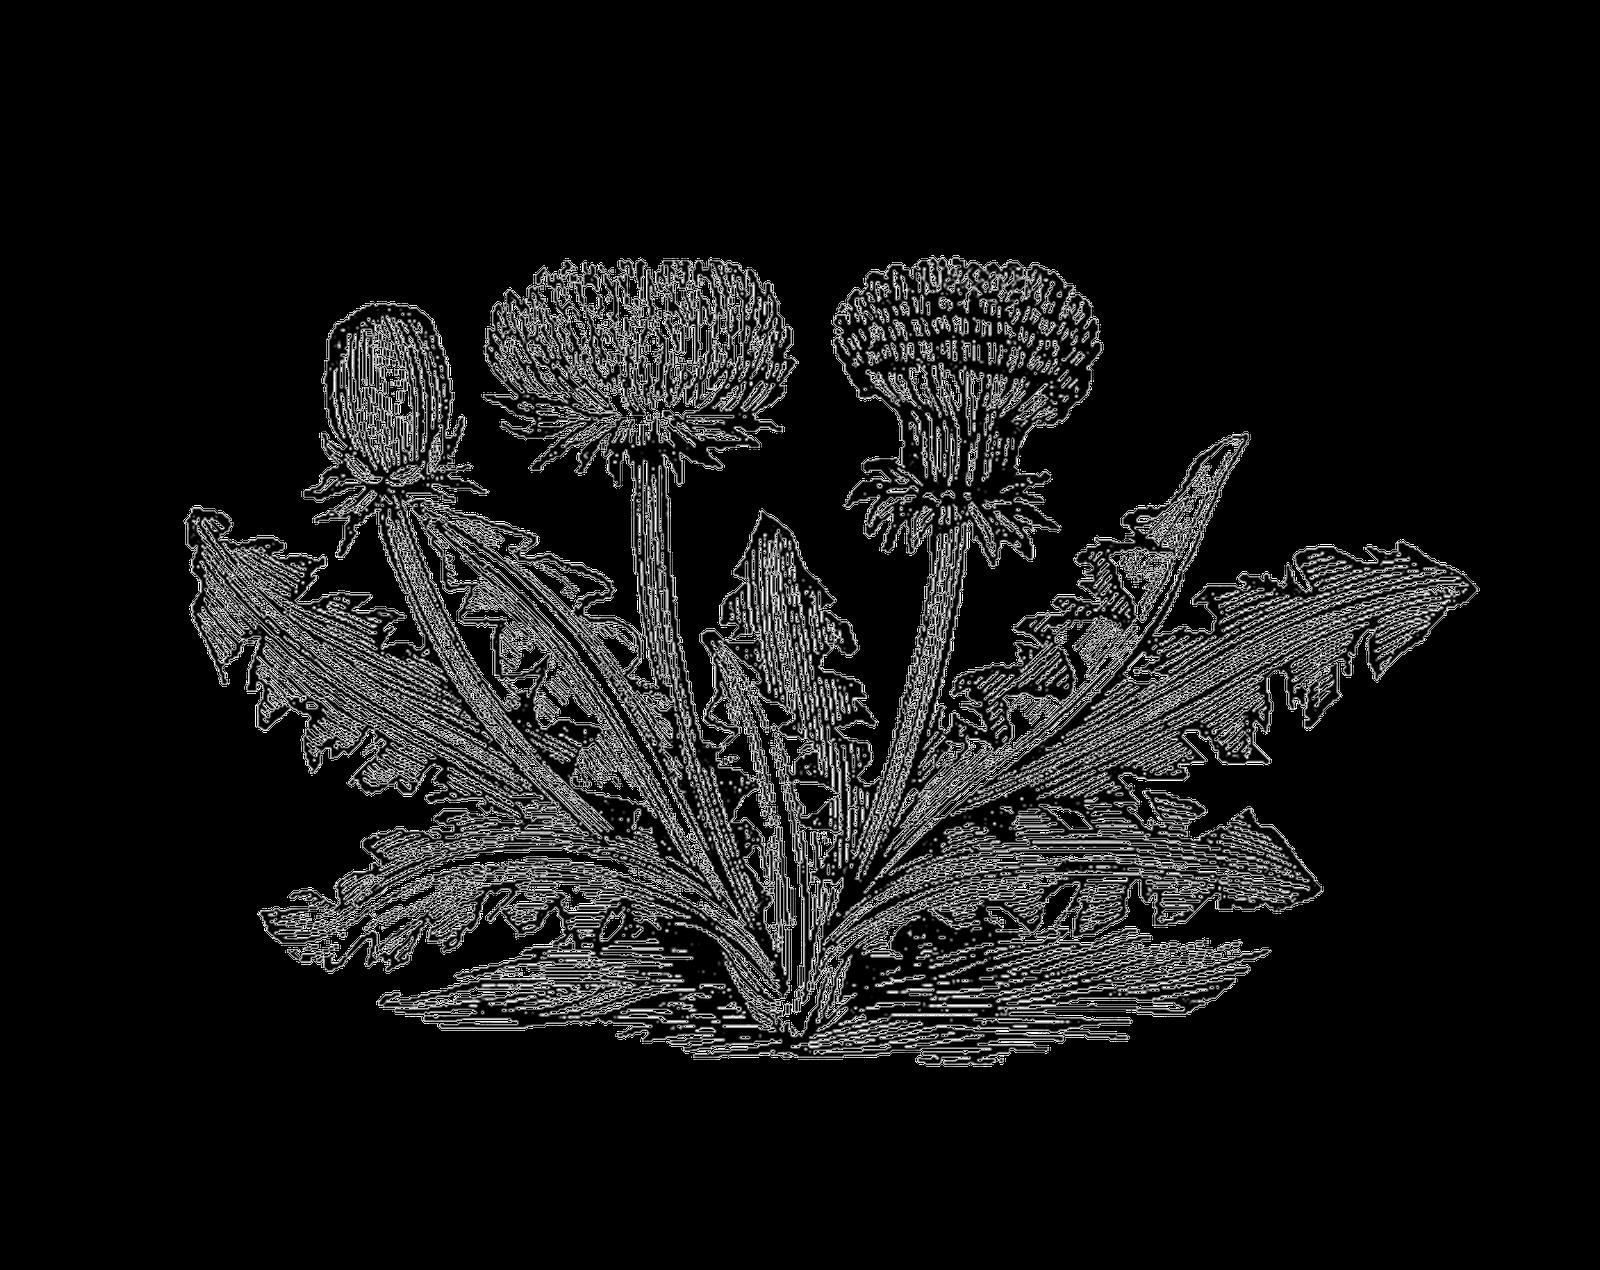 Antique images vintage botanical. Dandelion clipart royalty free